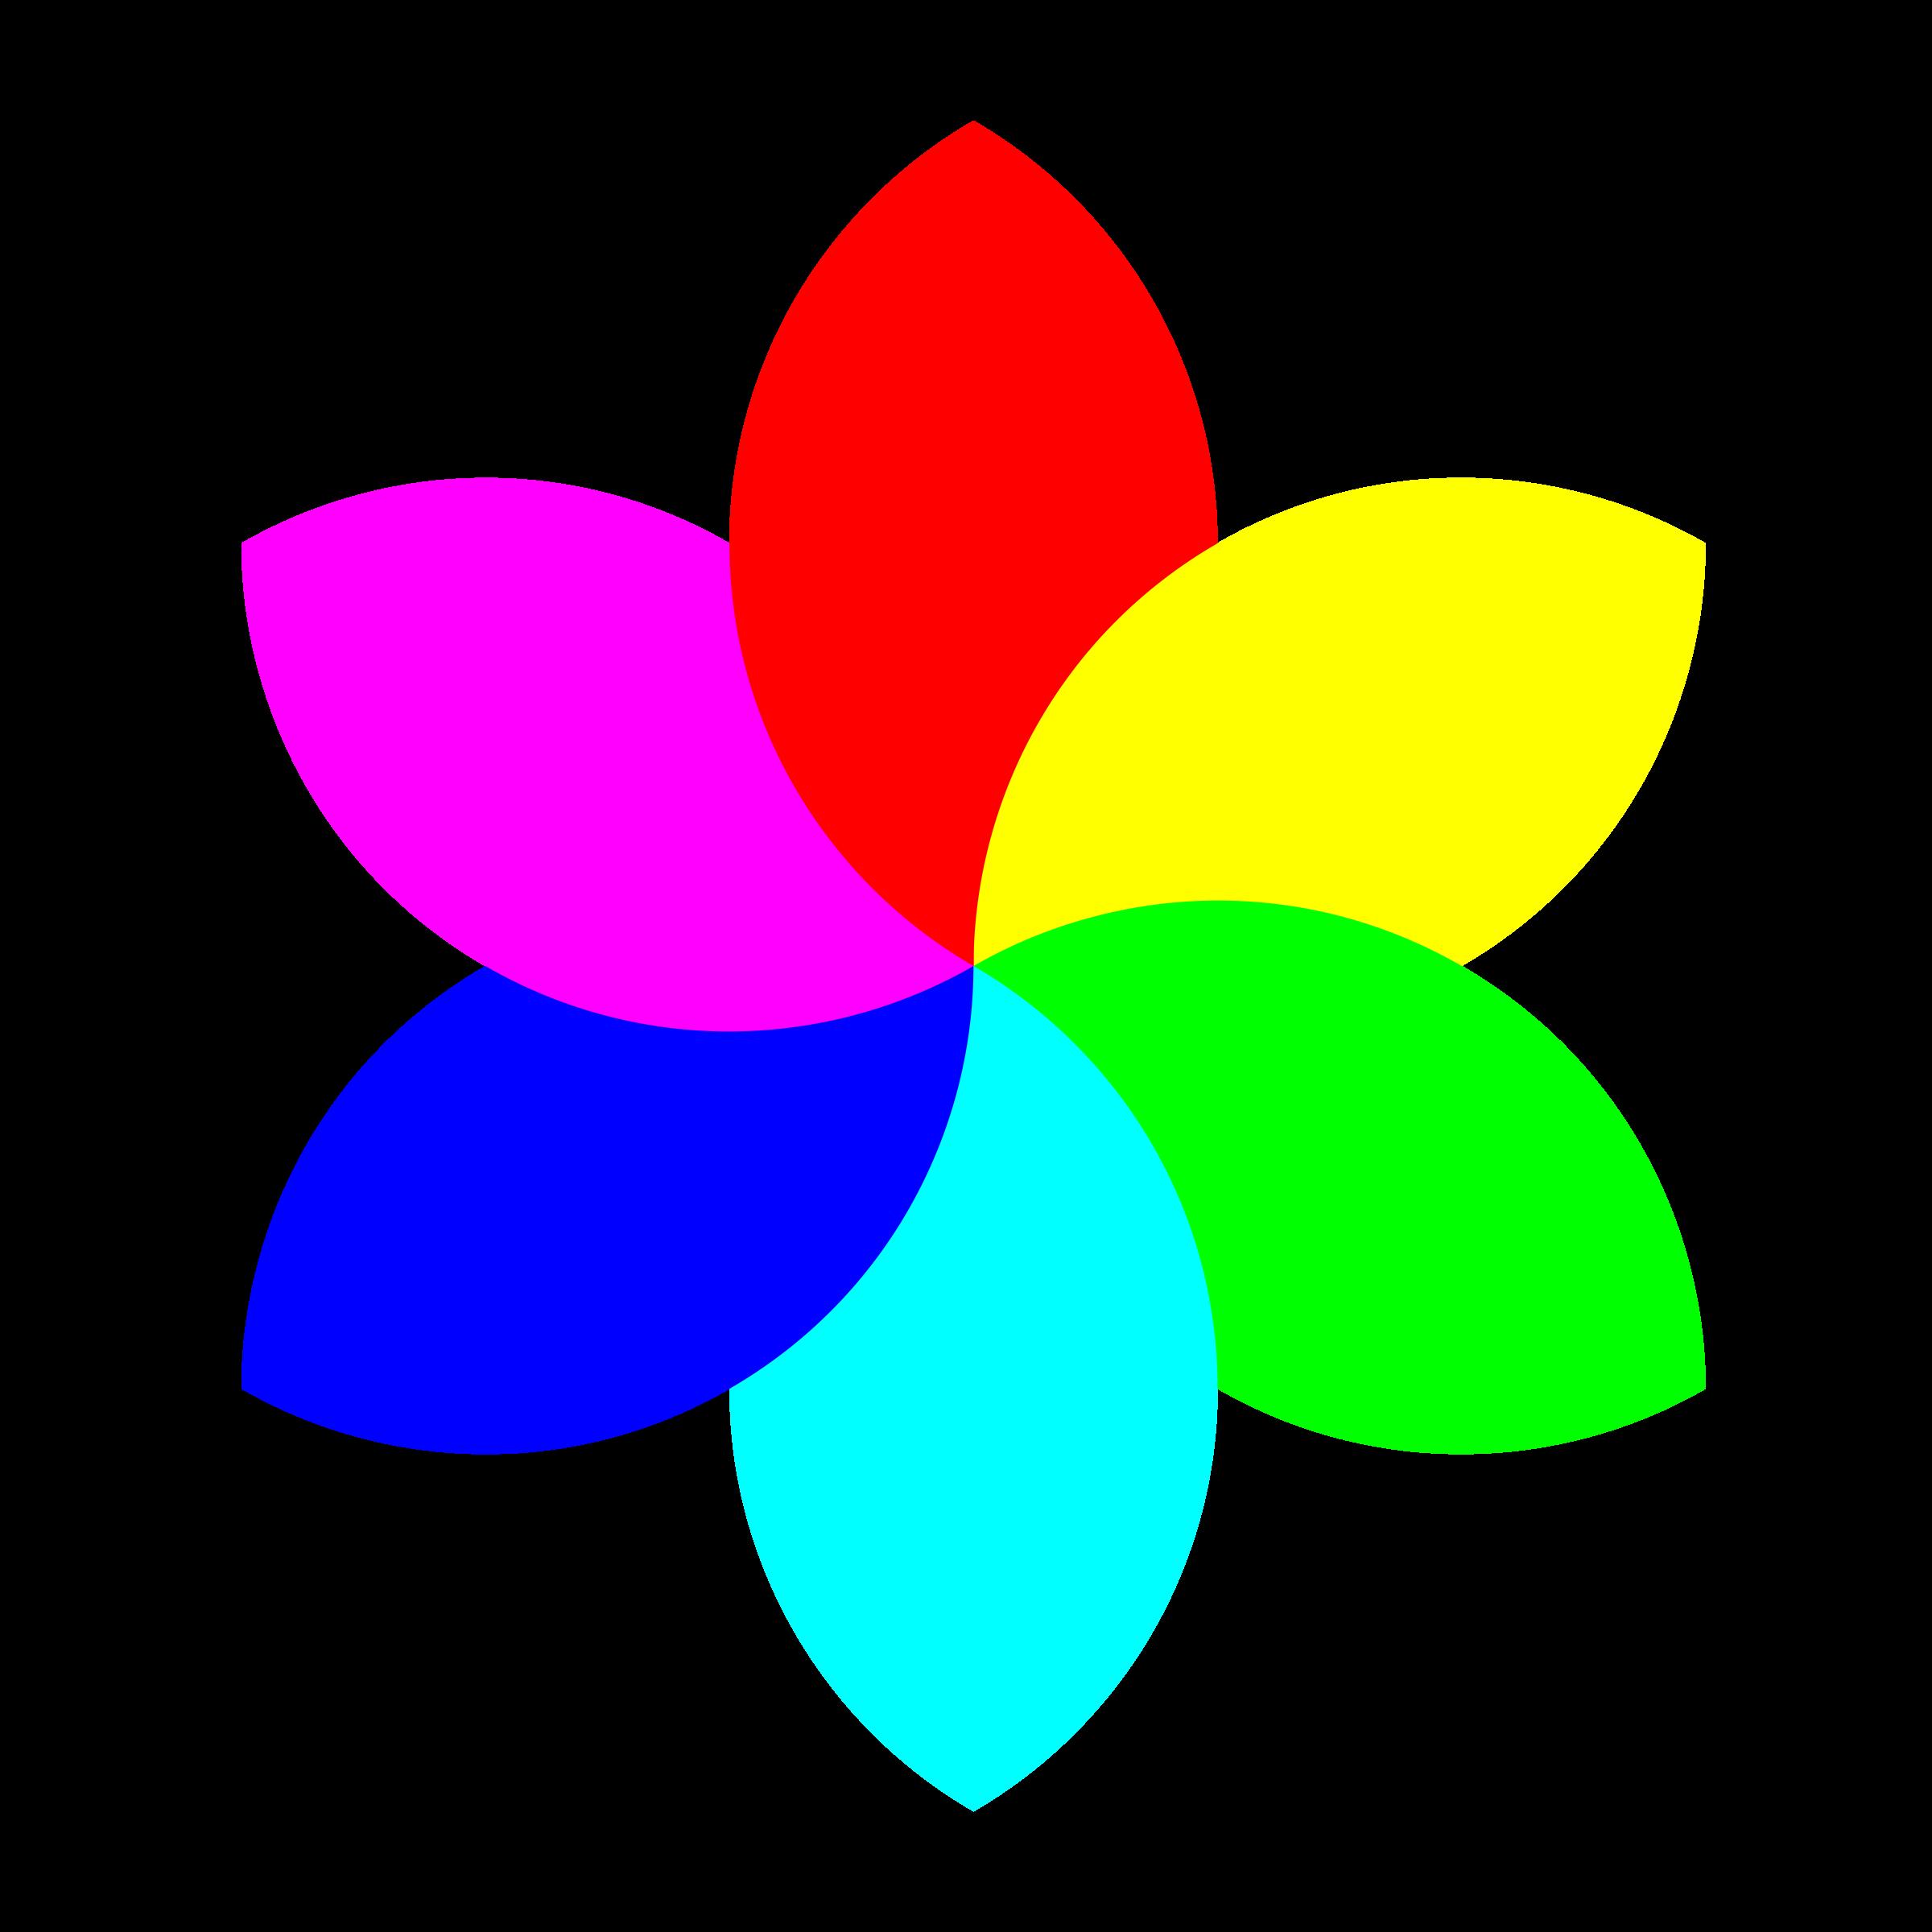 football petal flower. Flowers clipart rainbow